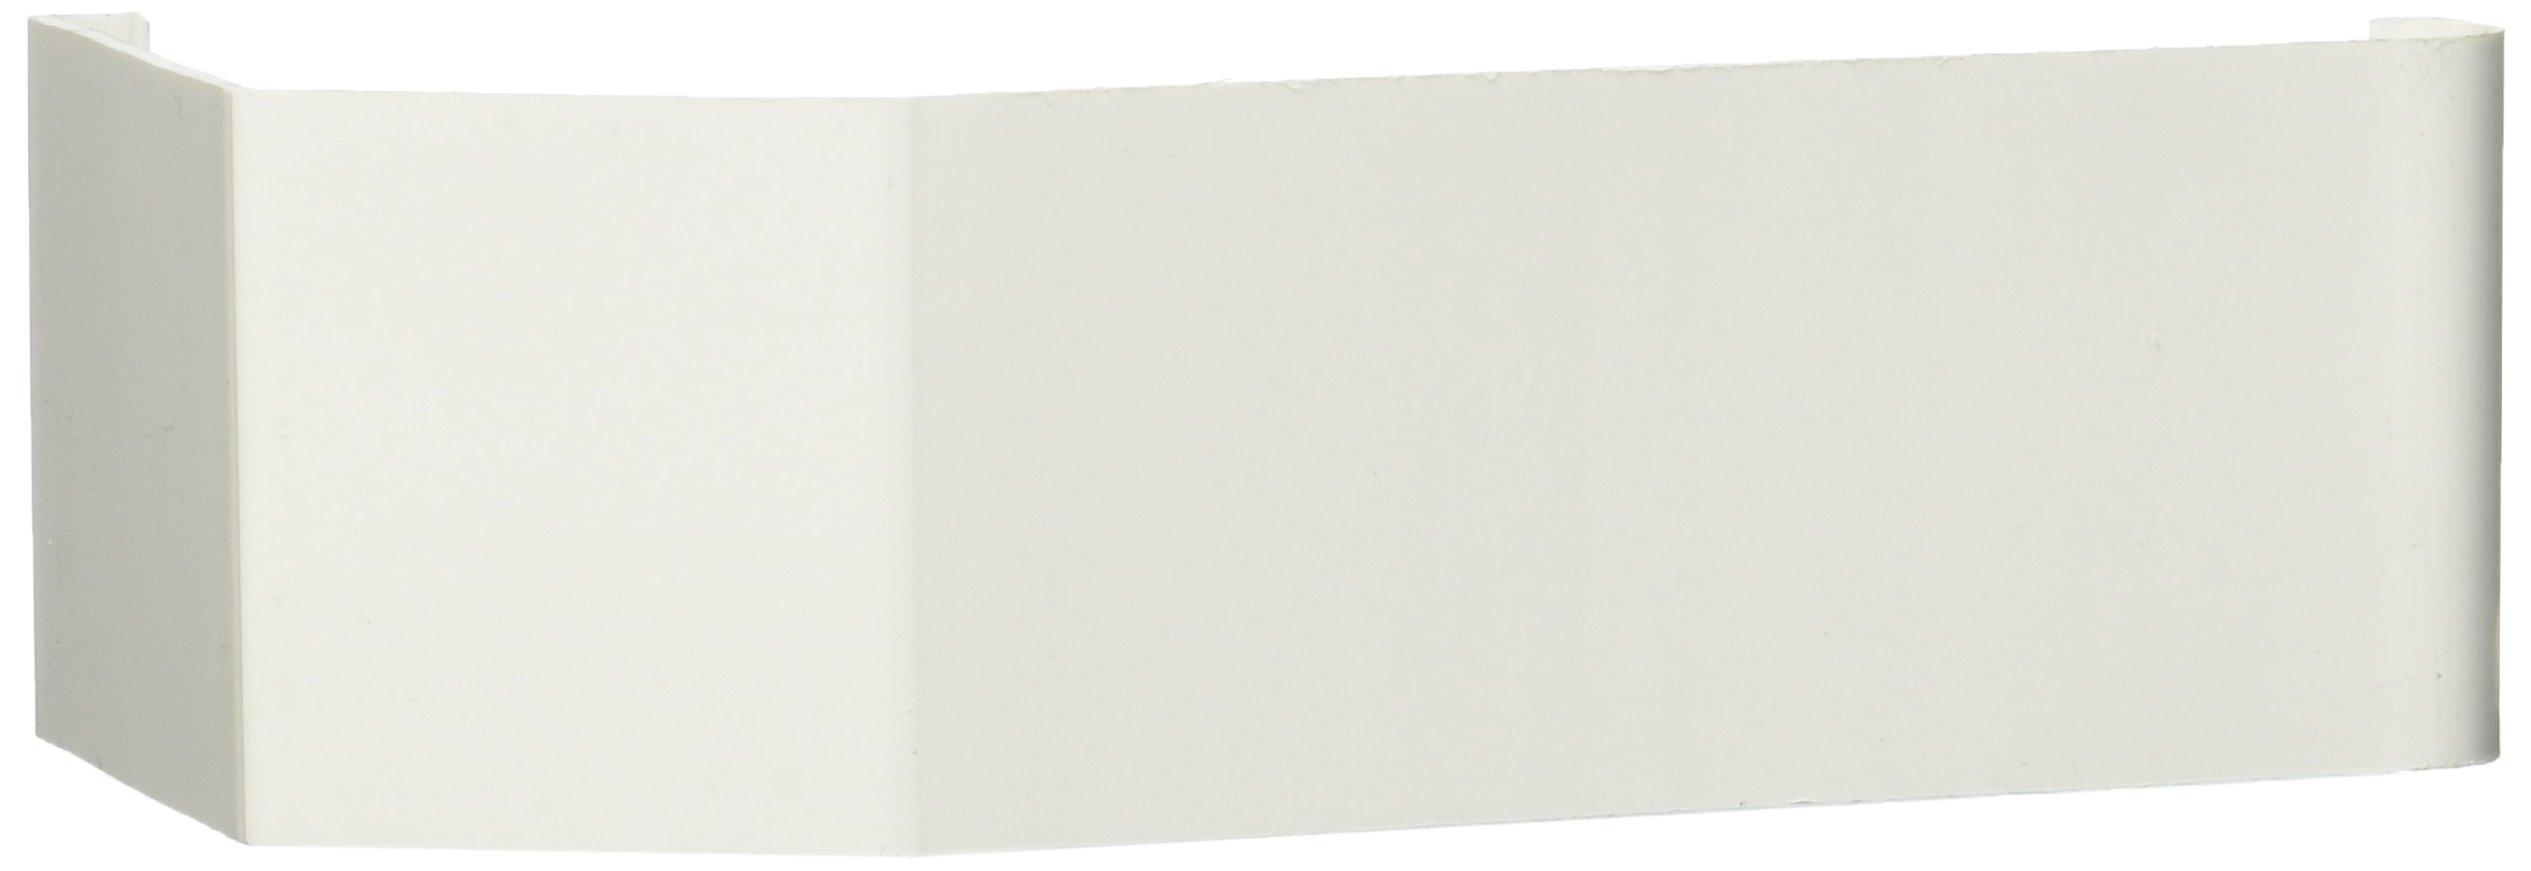 Neat Heat Baseboard Covers Bright Splice Plate